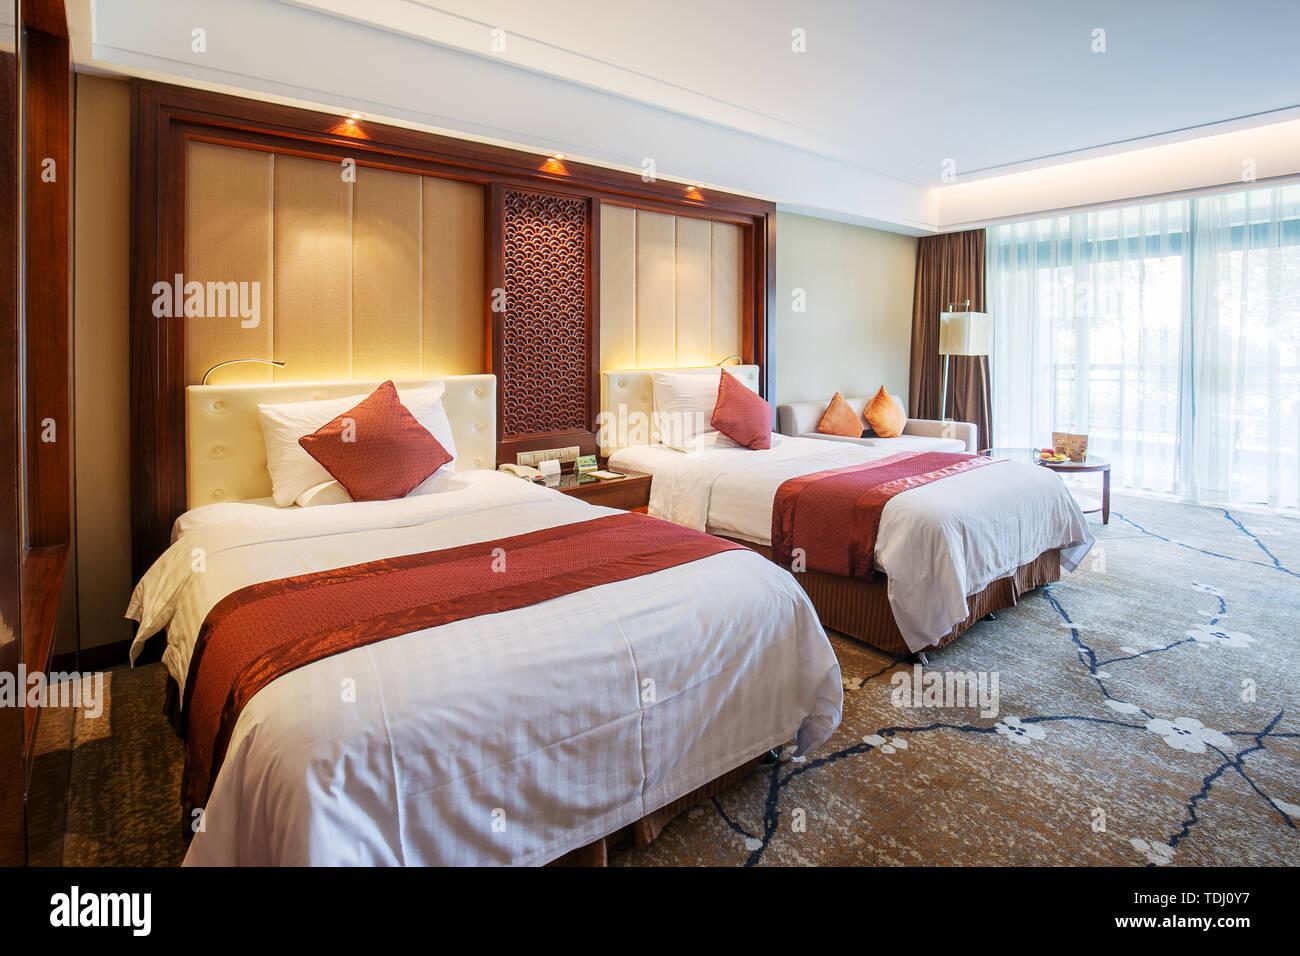 A Modern Twin Bedroom Stock Photo Alamy